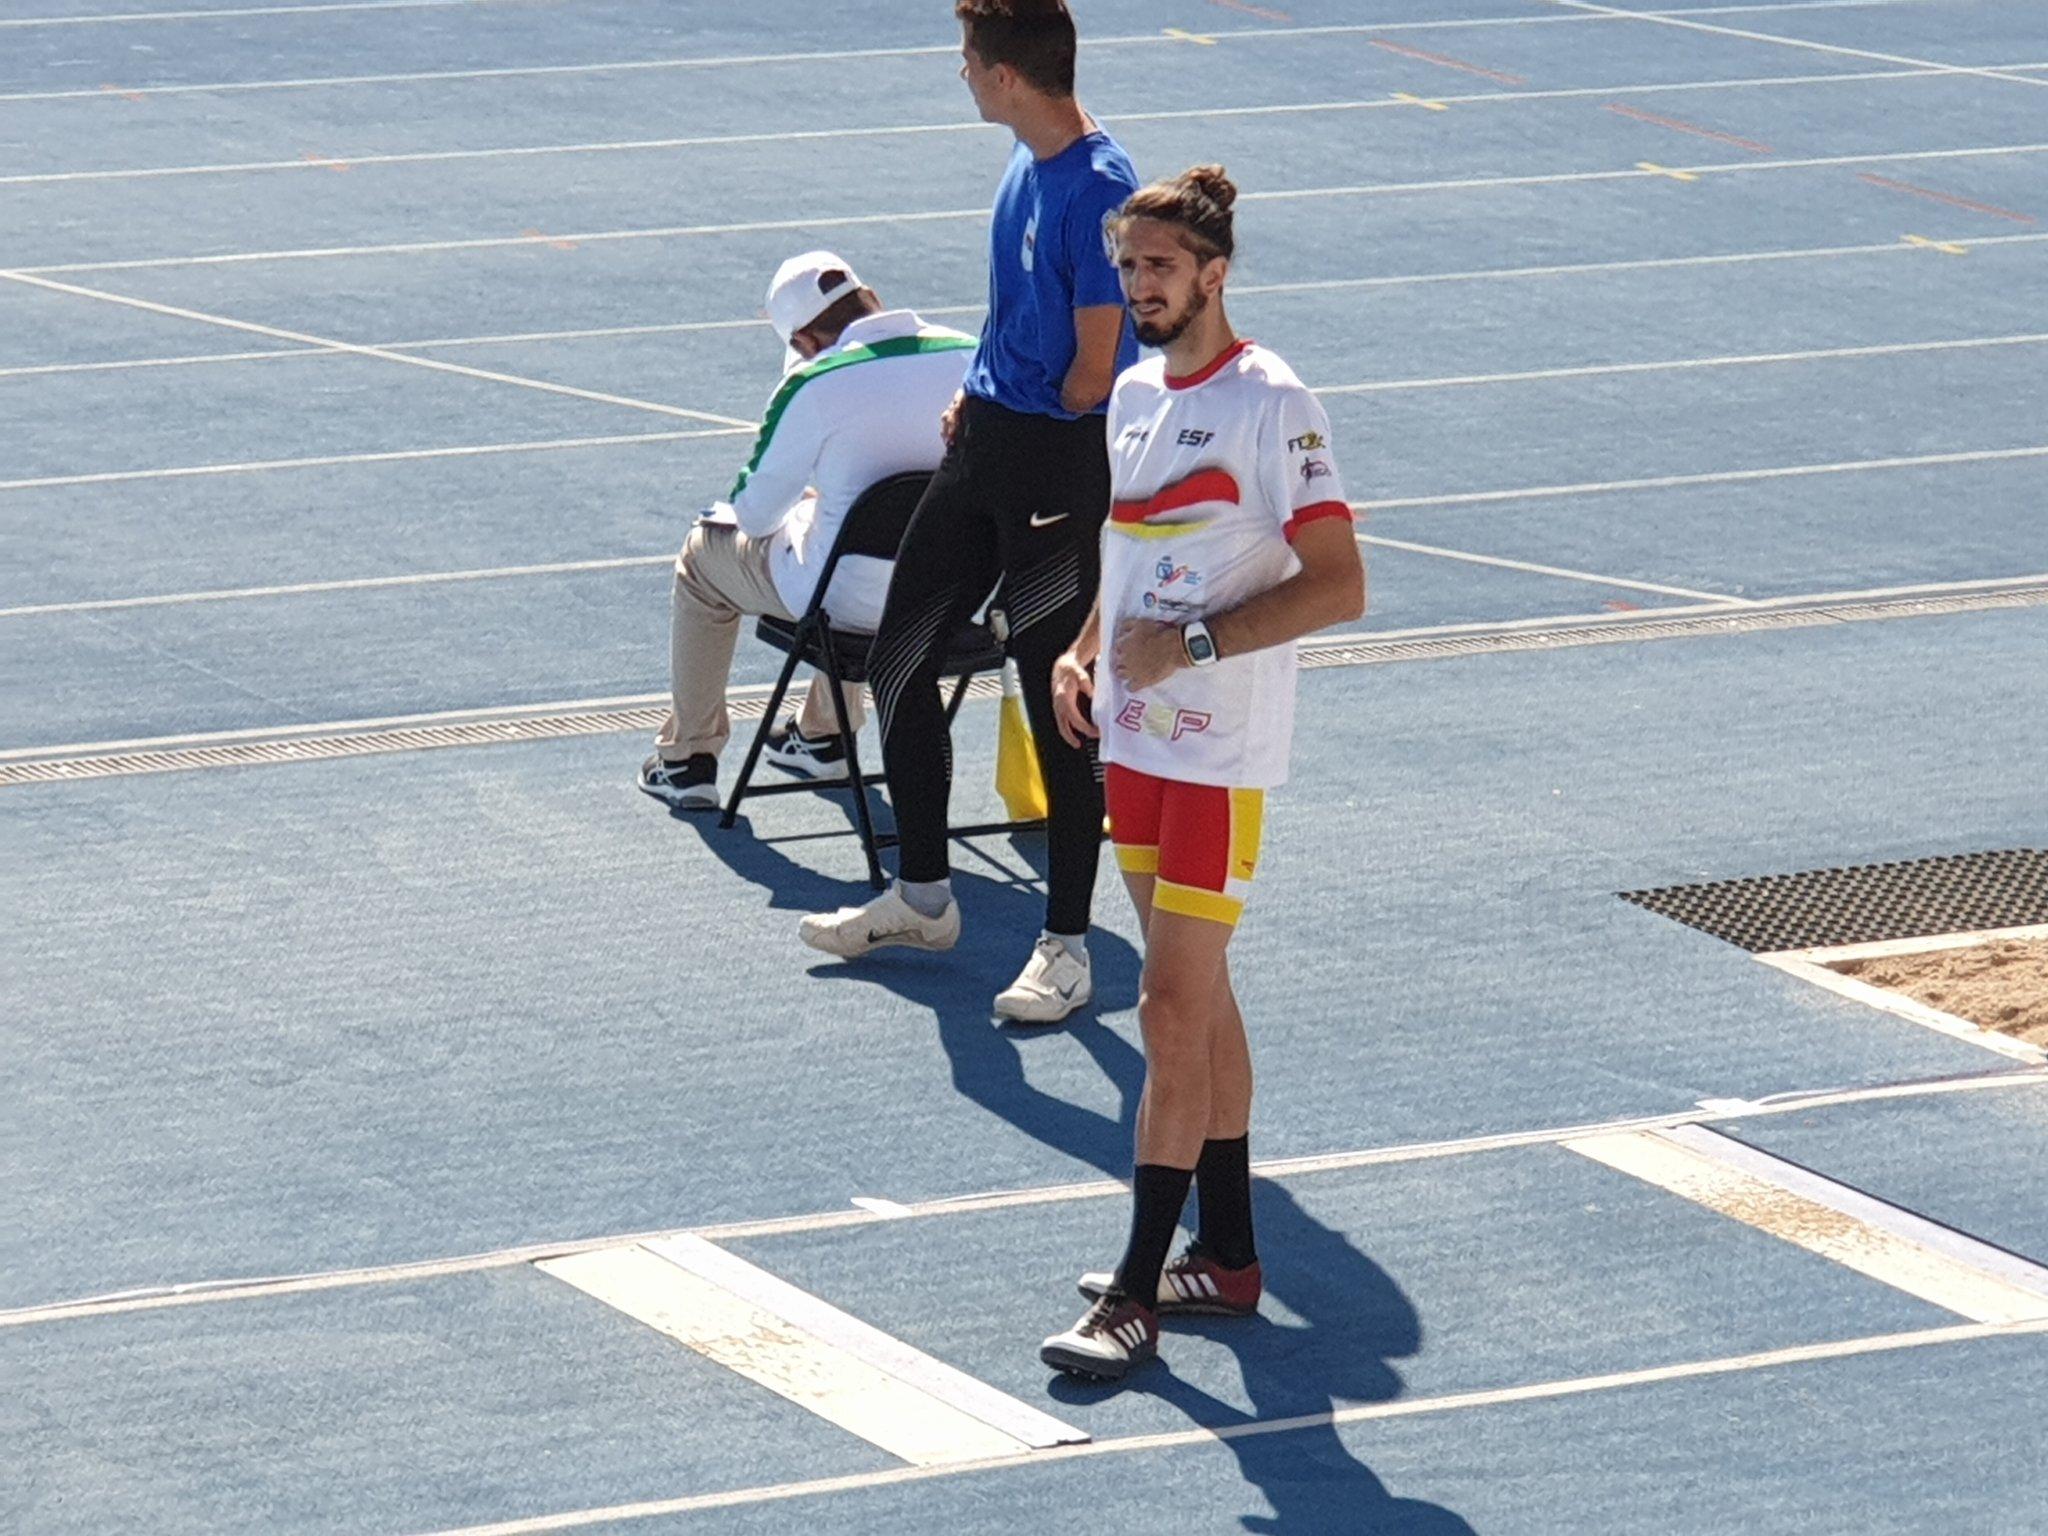 Daniel Pérez, en los prolegómenos de la prueba del salto de longitud en Dubai. COMITÉ PARALÍMPICO ESPAÑOL